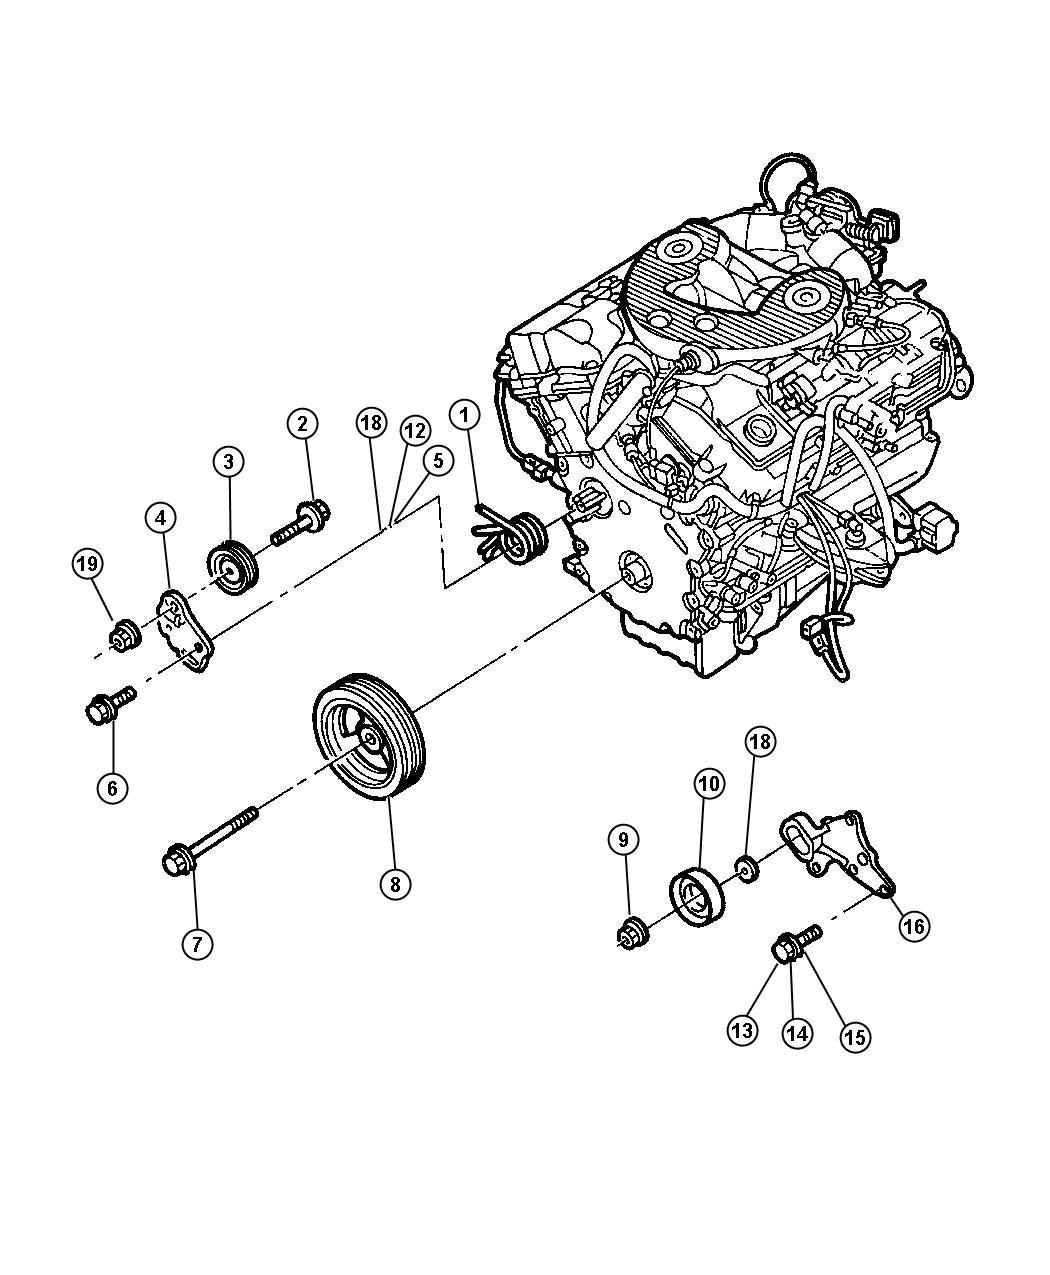 Jeep Grand Cherokee Damper Crankshaft Vibration